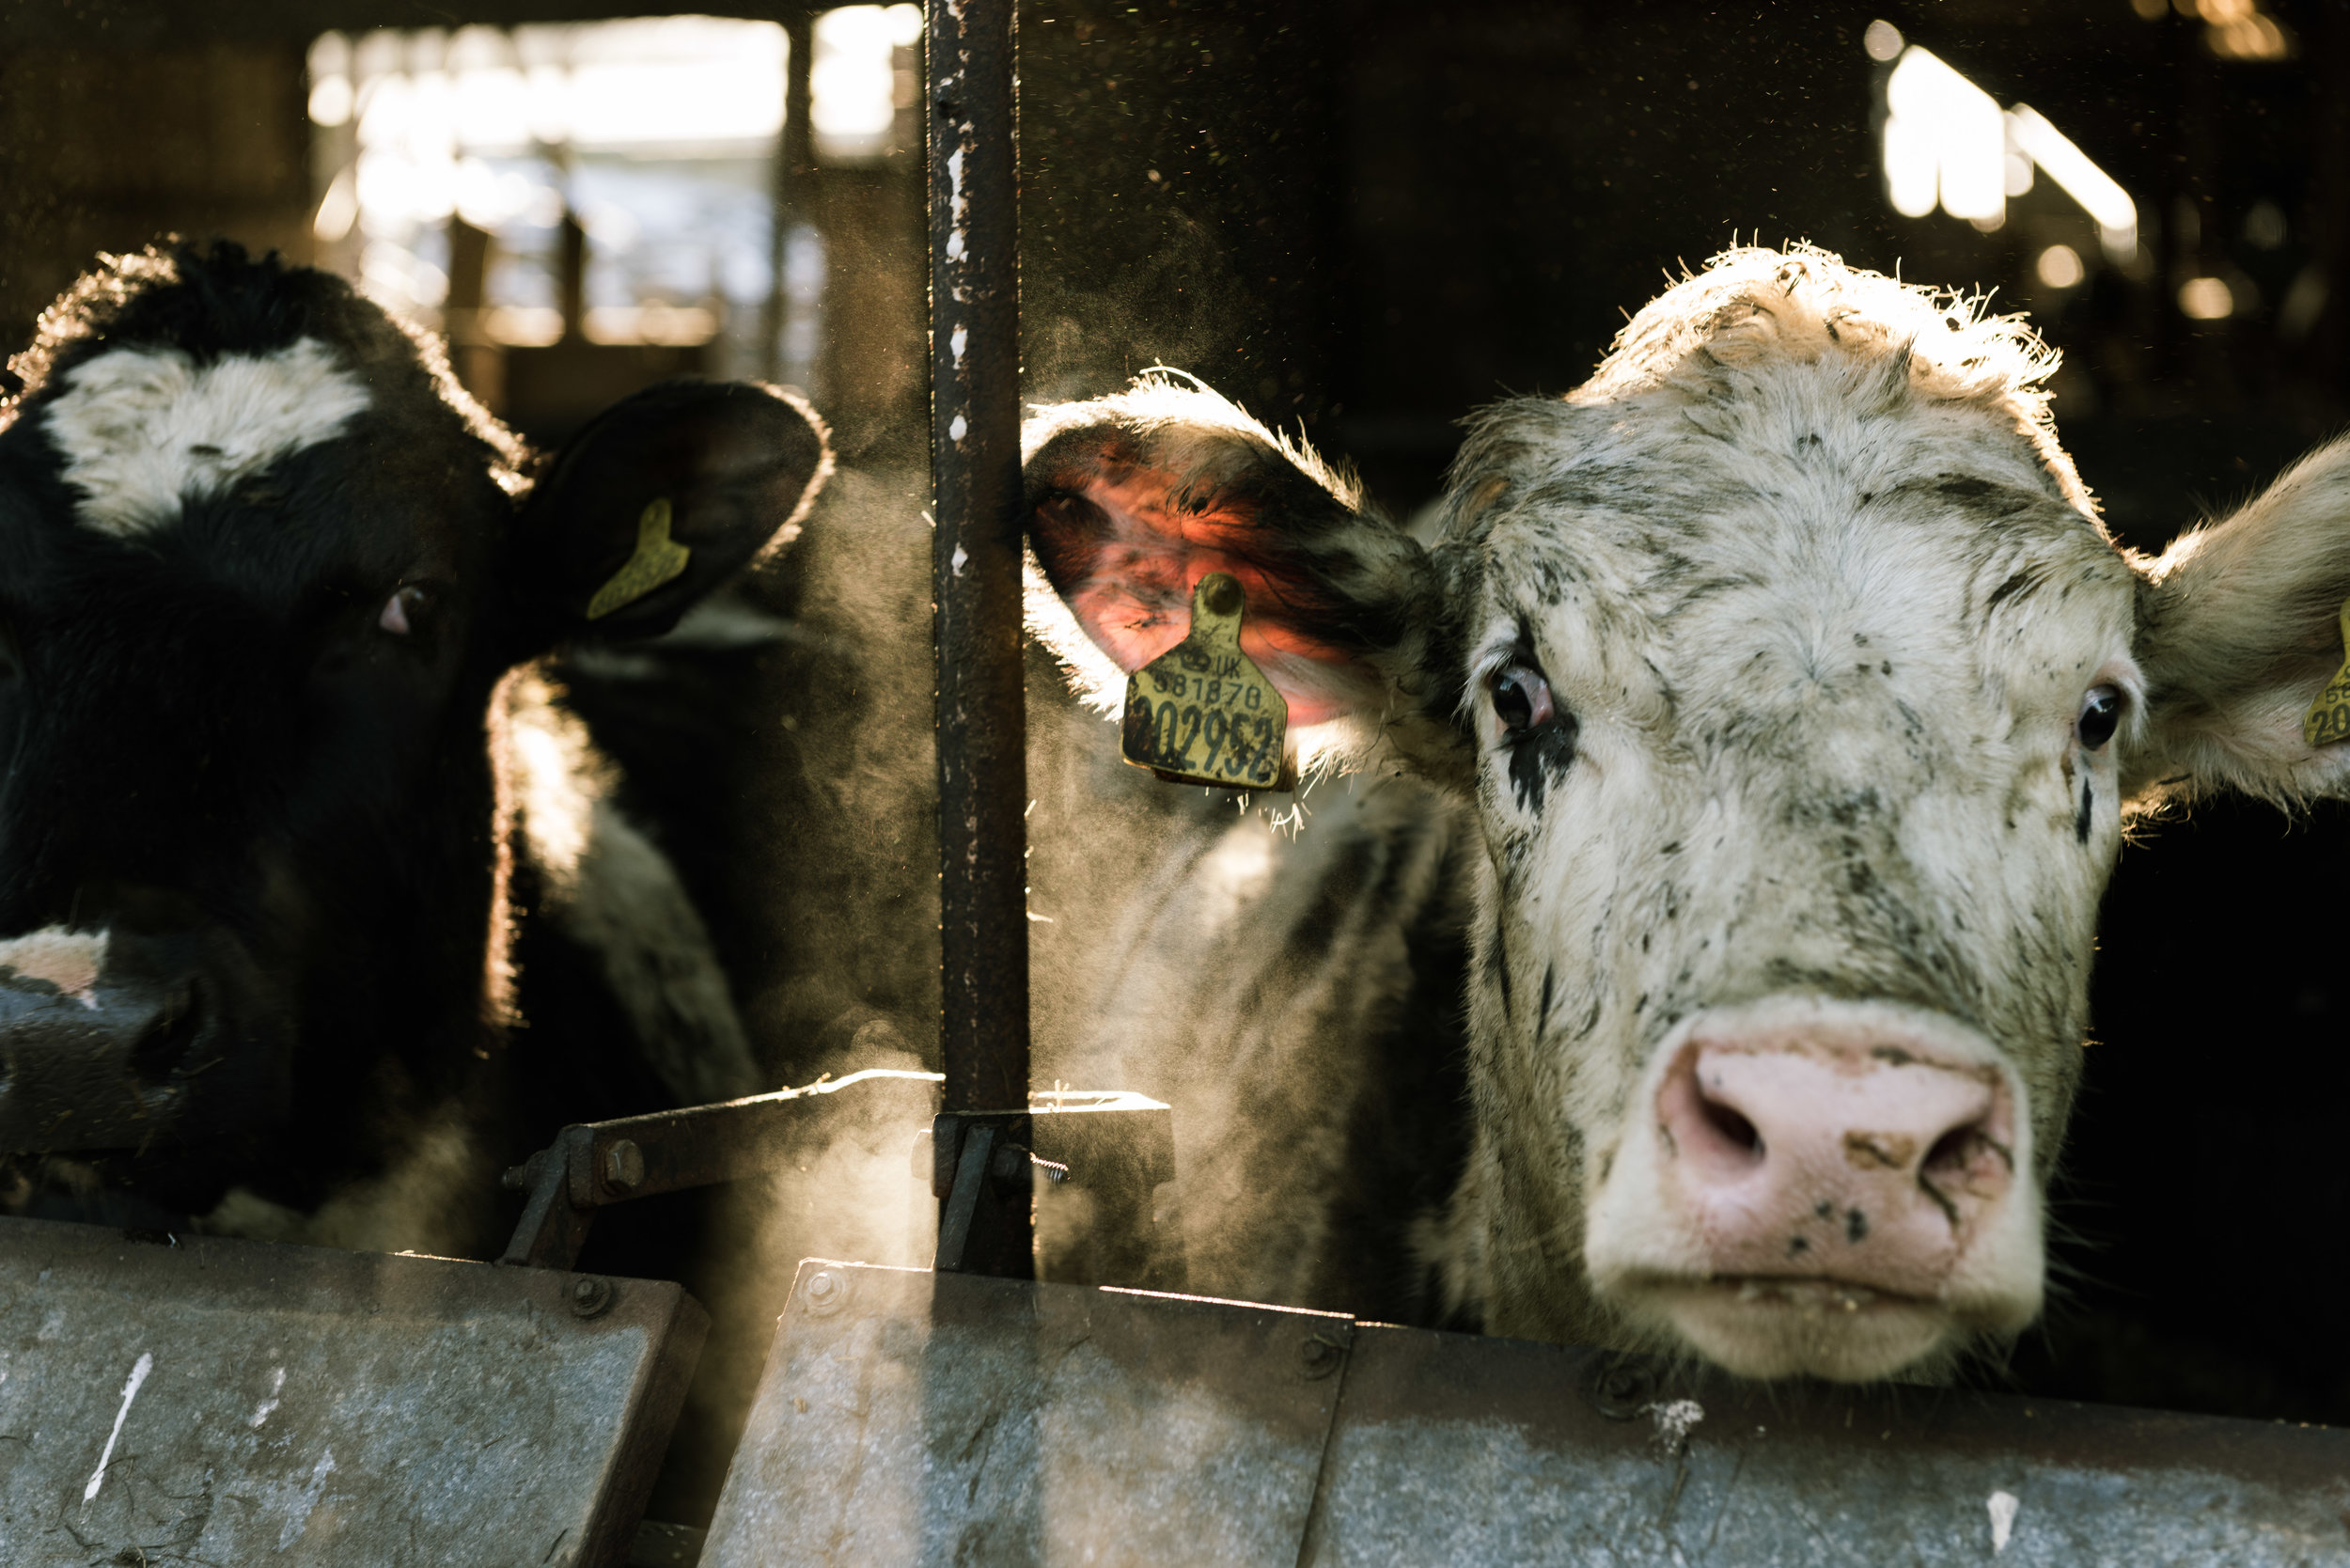 dairy-farm-light-beam-cow (1 of 1).jpg